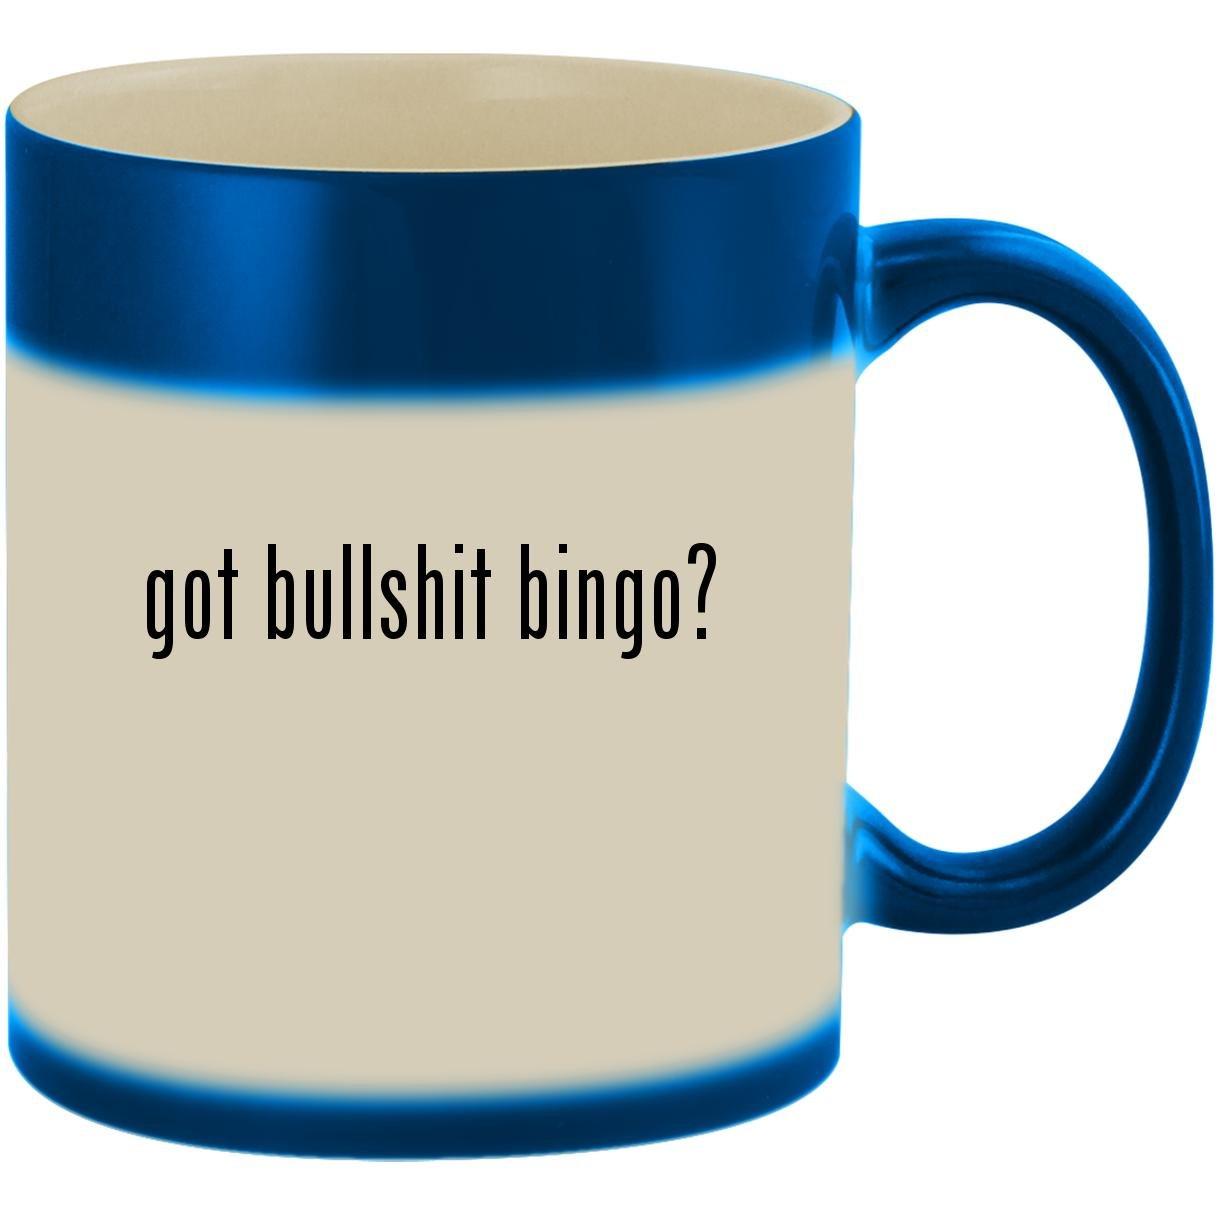 got bullshit bingo? - 11oz Ceramic Color Changing Heat Sensitive Coffee Mug Cup, Blue